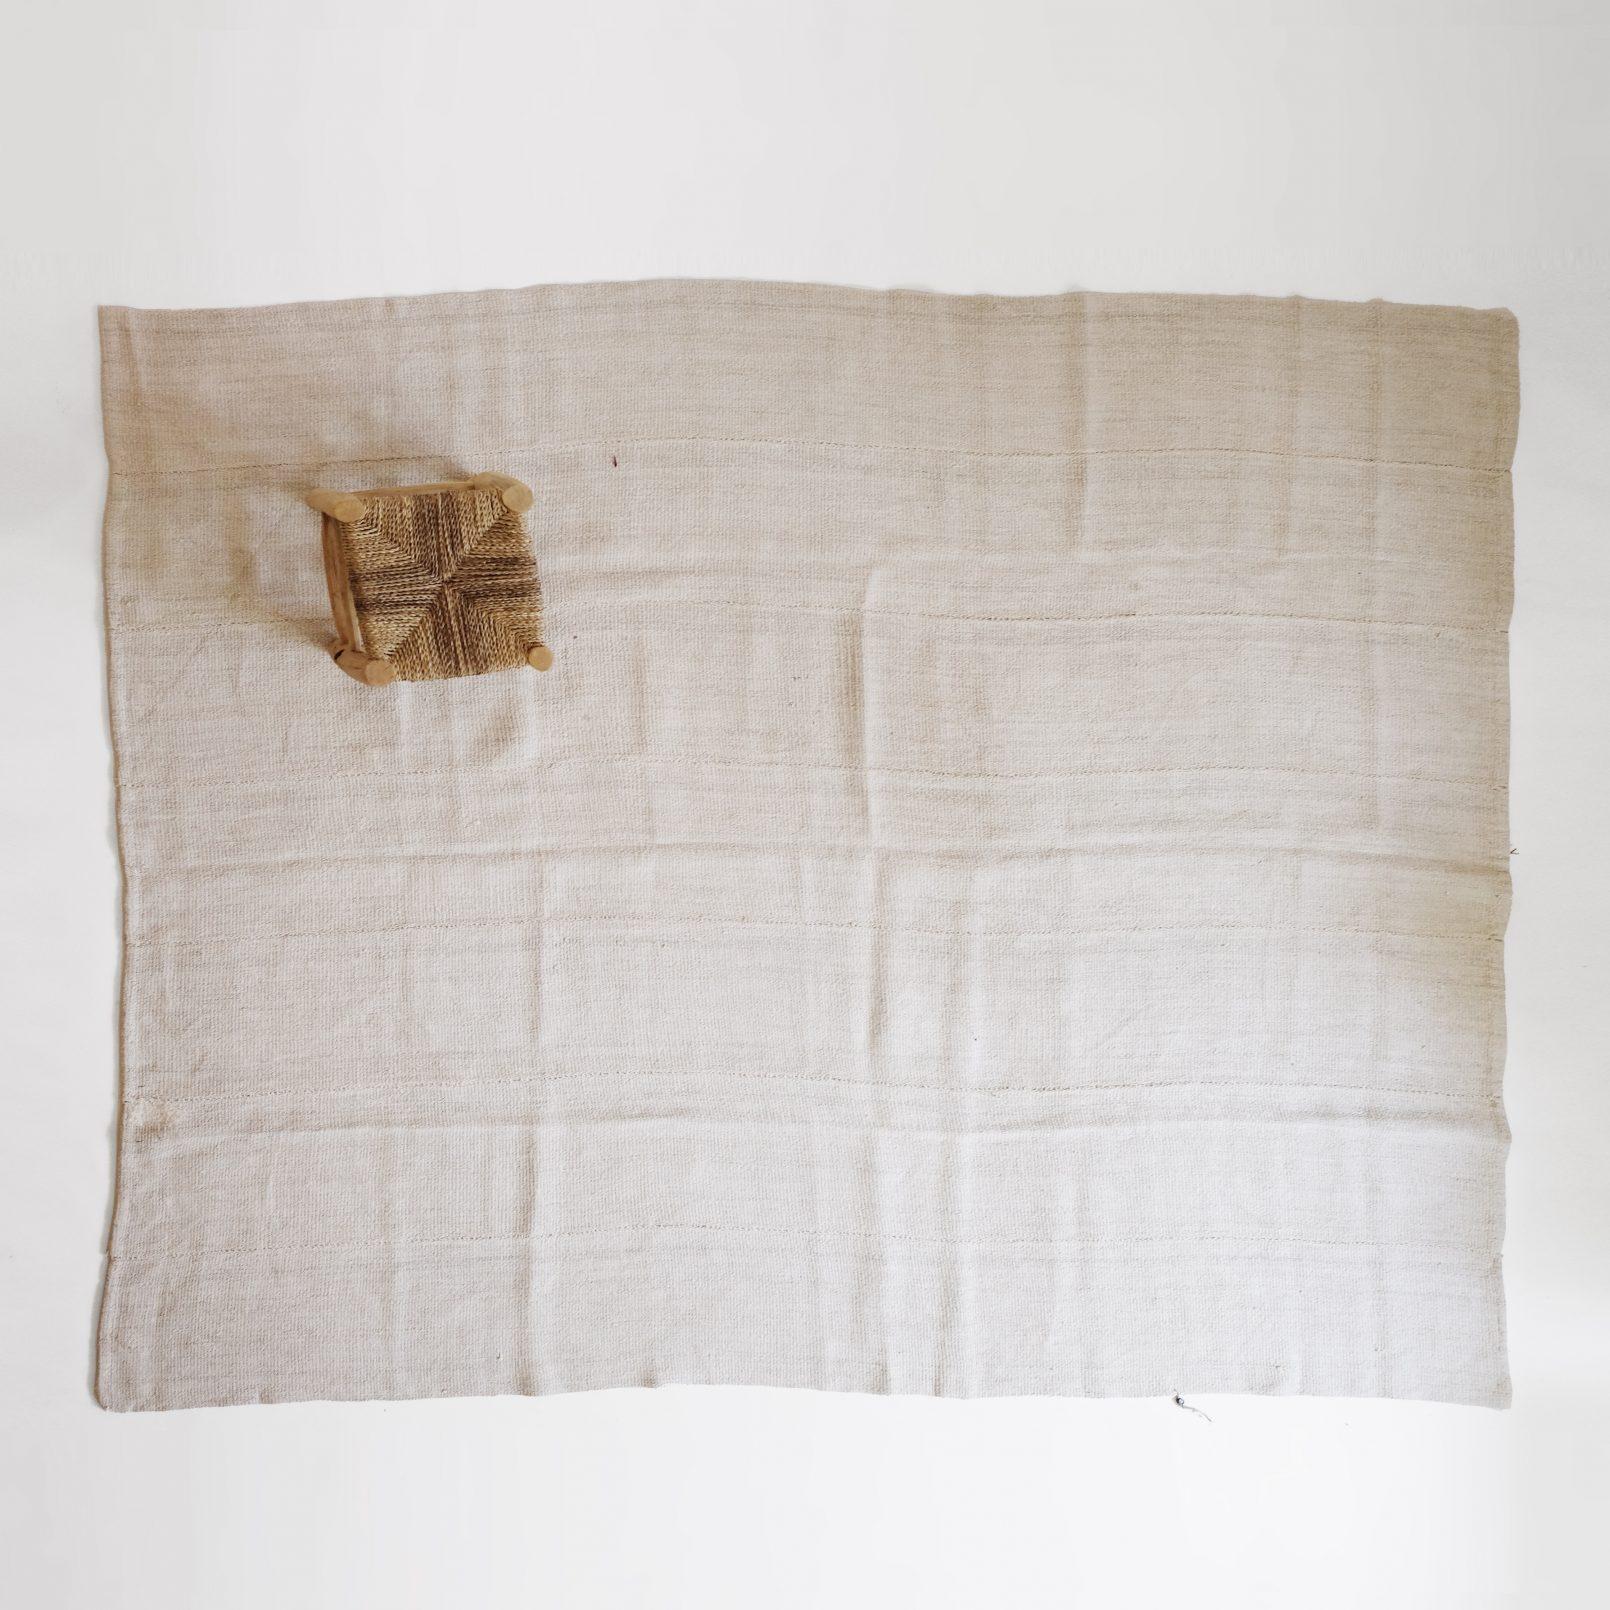 Tapis en chanvre d'origine turque, 240 x 190 cm.